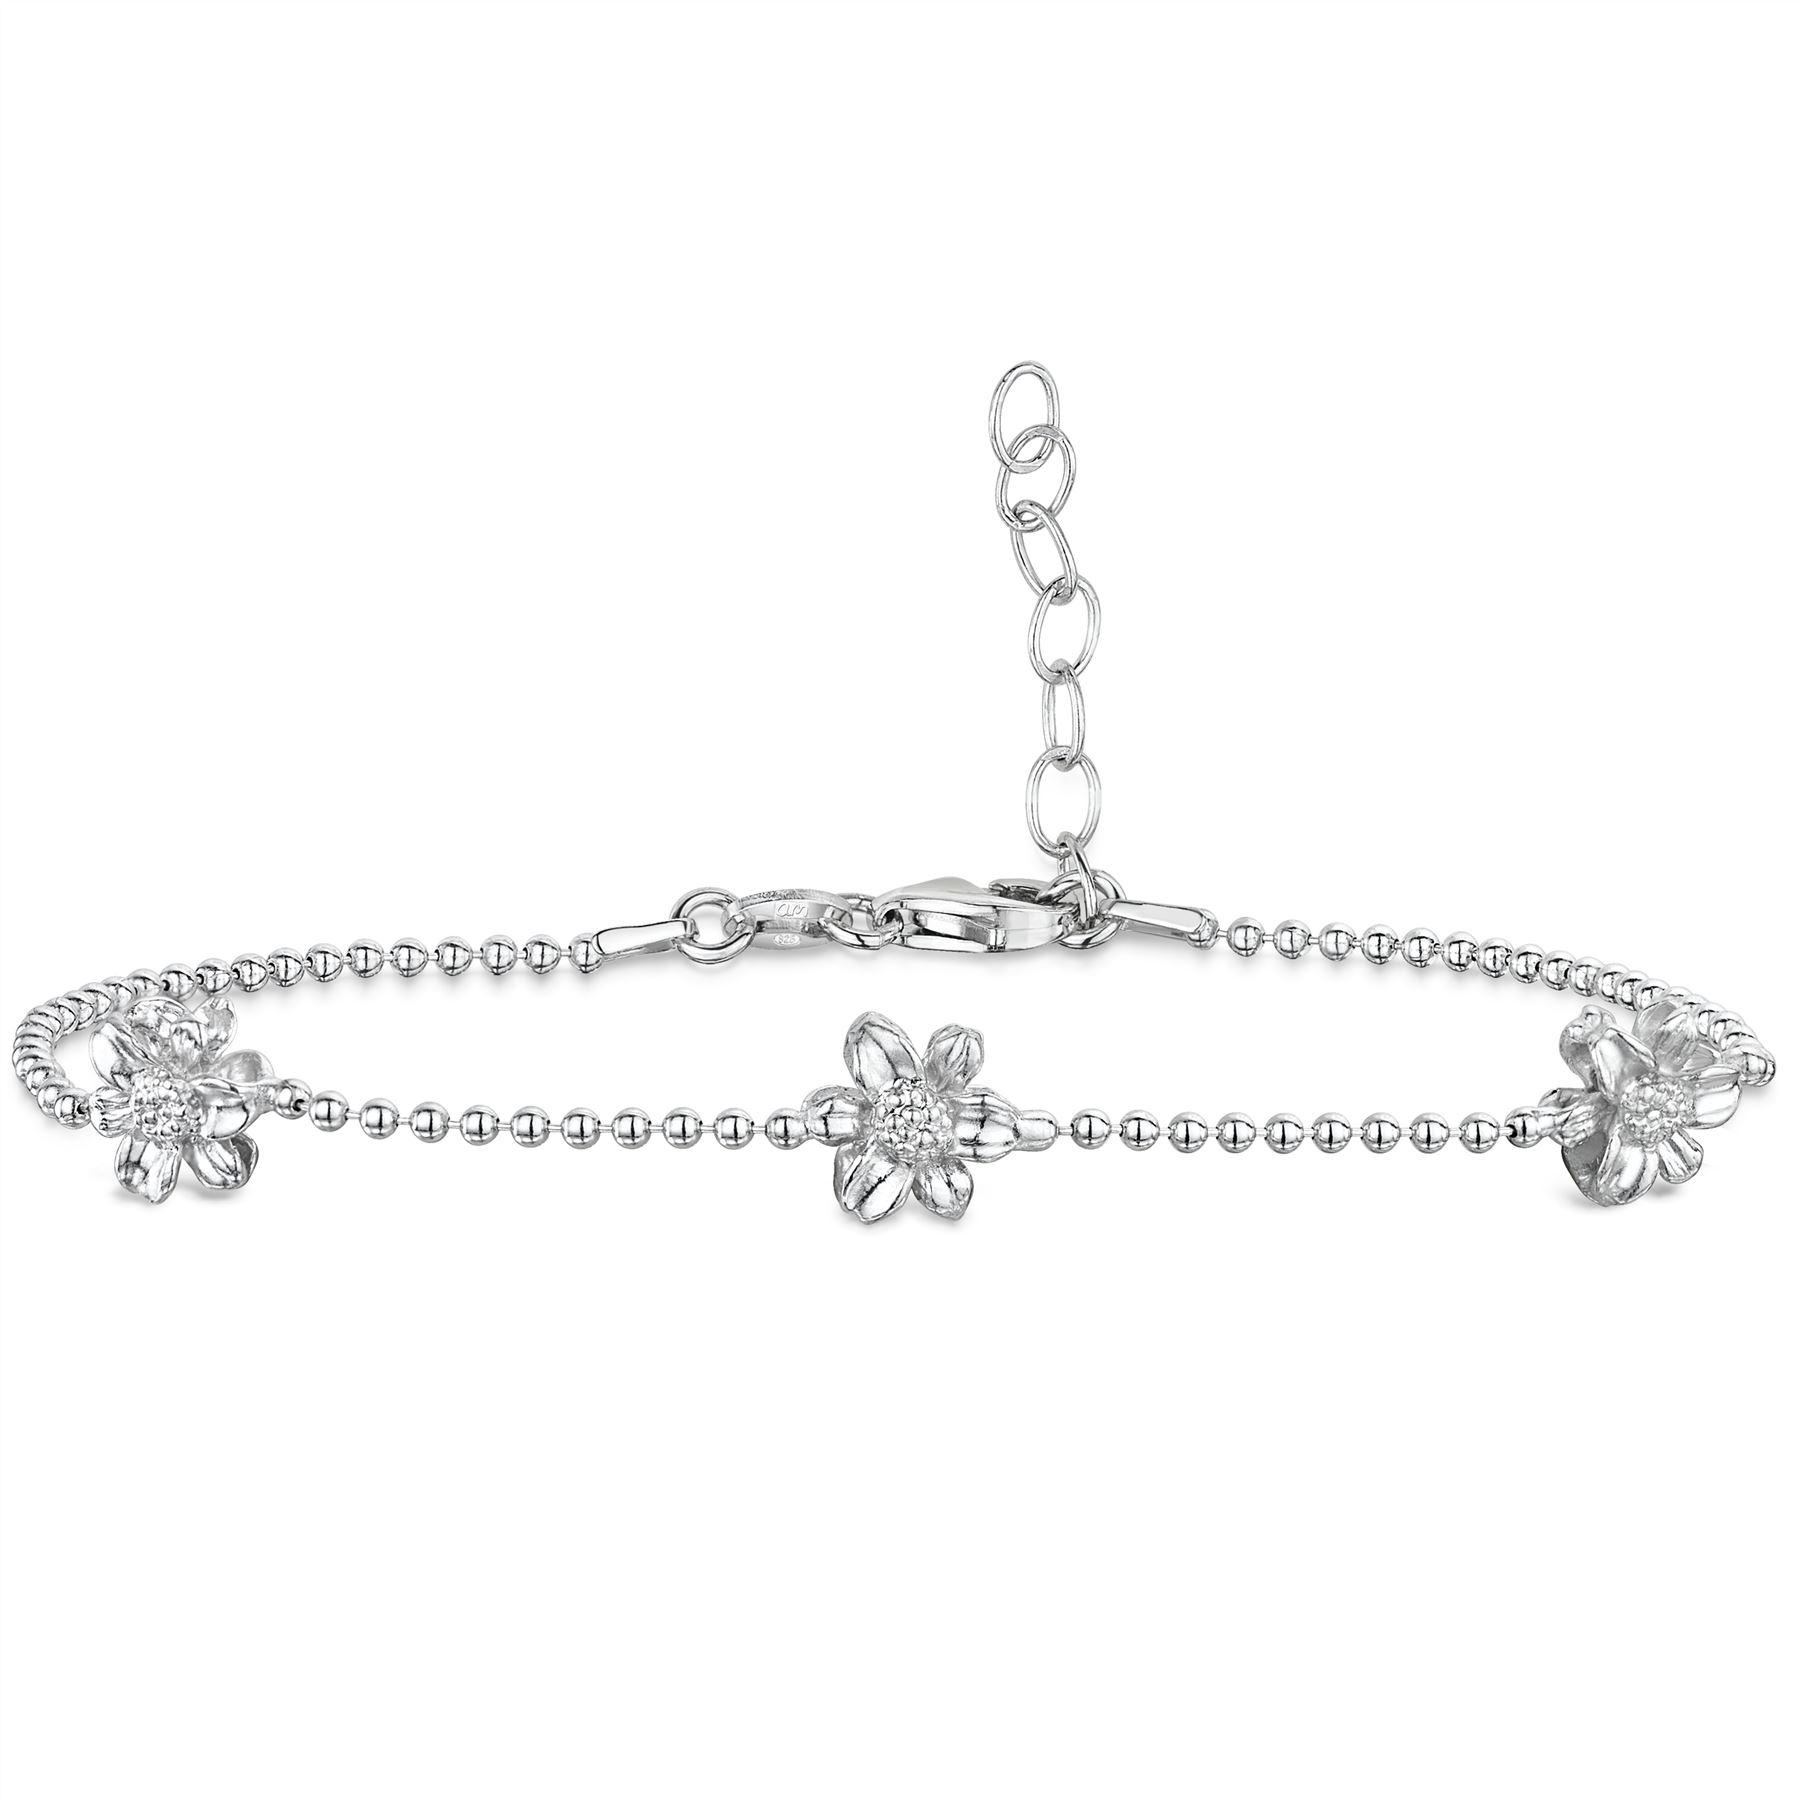 Amberta-Jewelry-925-Sterling-Silver-Adjustable-Bracelet-Italian-Bangle-for-Women thumbnail 45